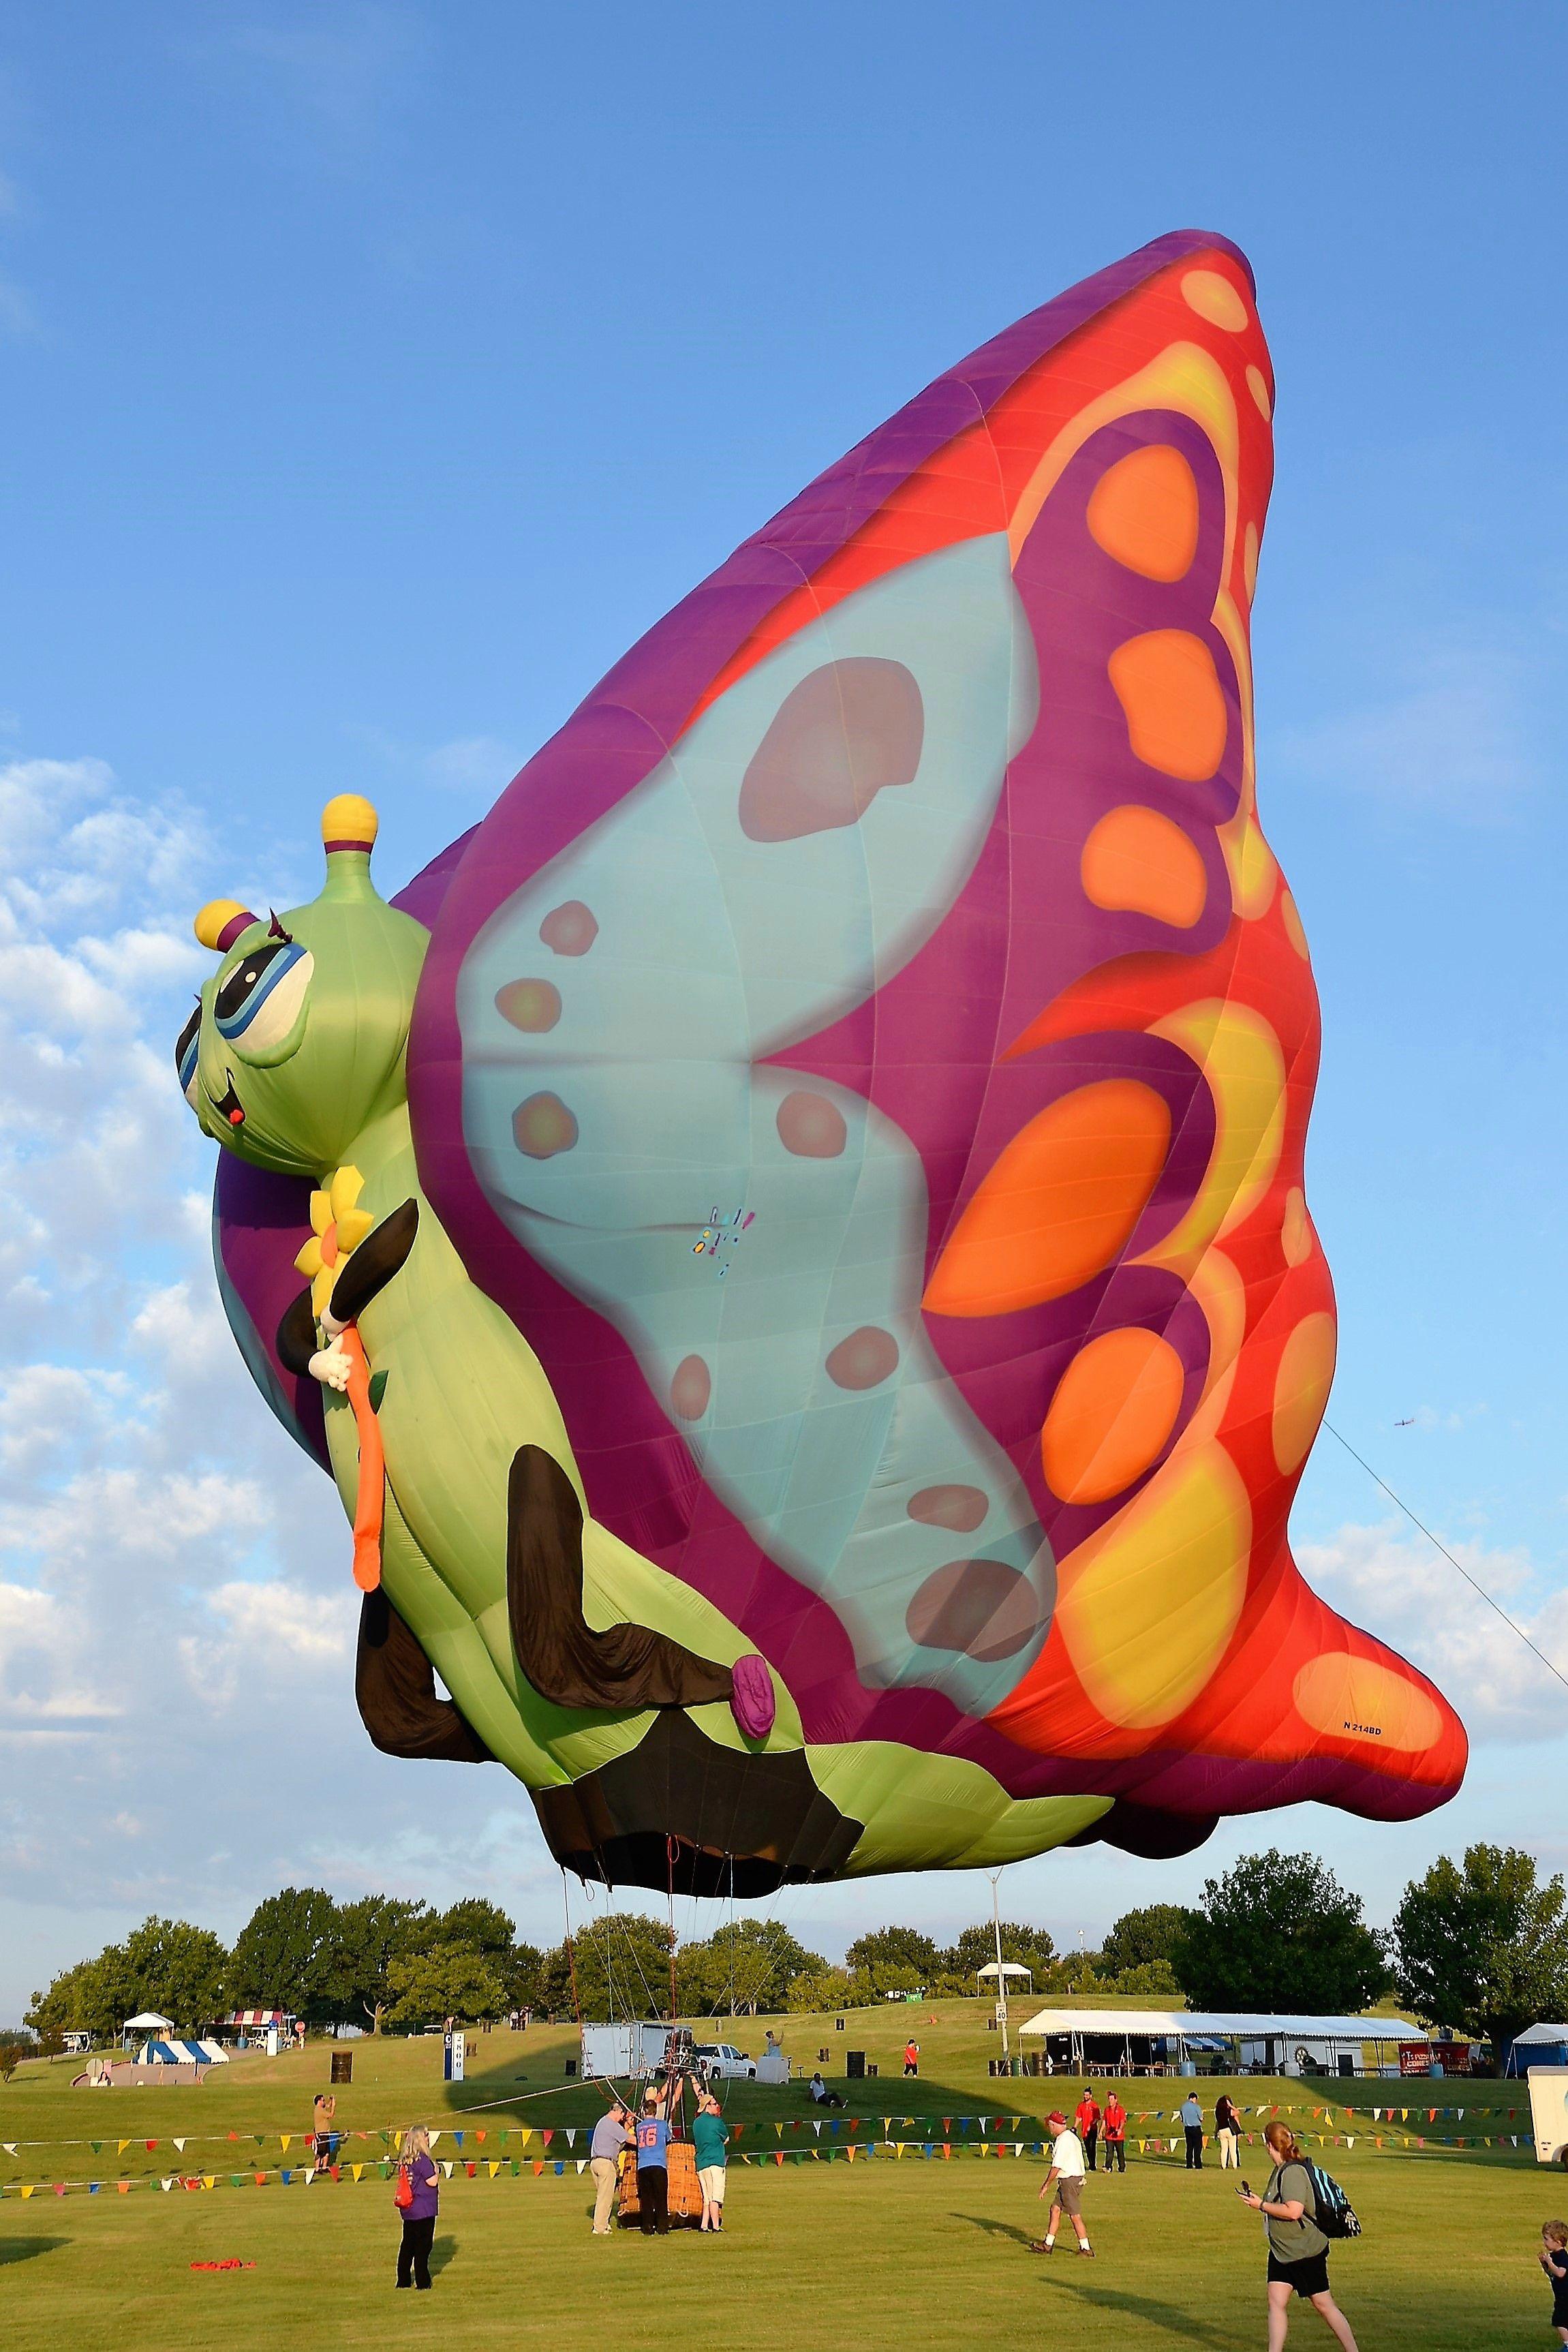 2016 InTouch Credit Union Plano Balloon Festival